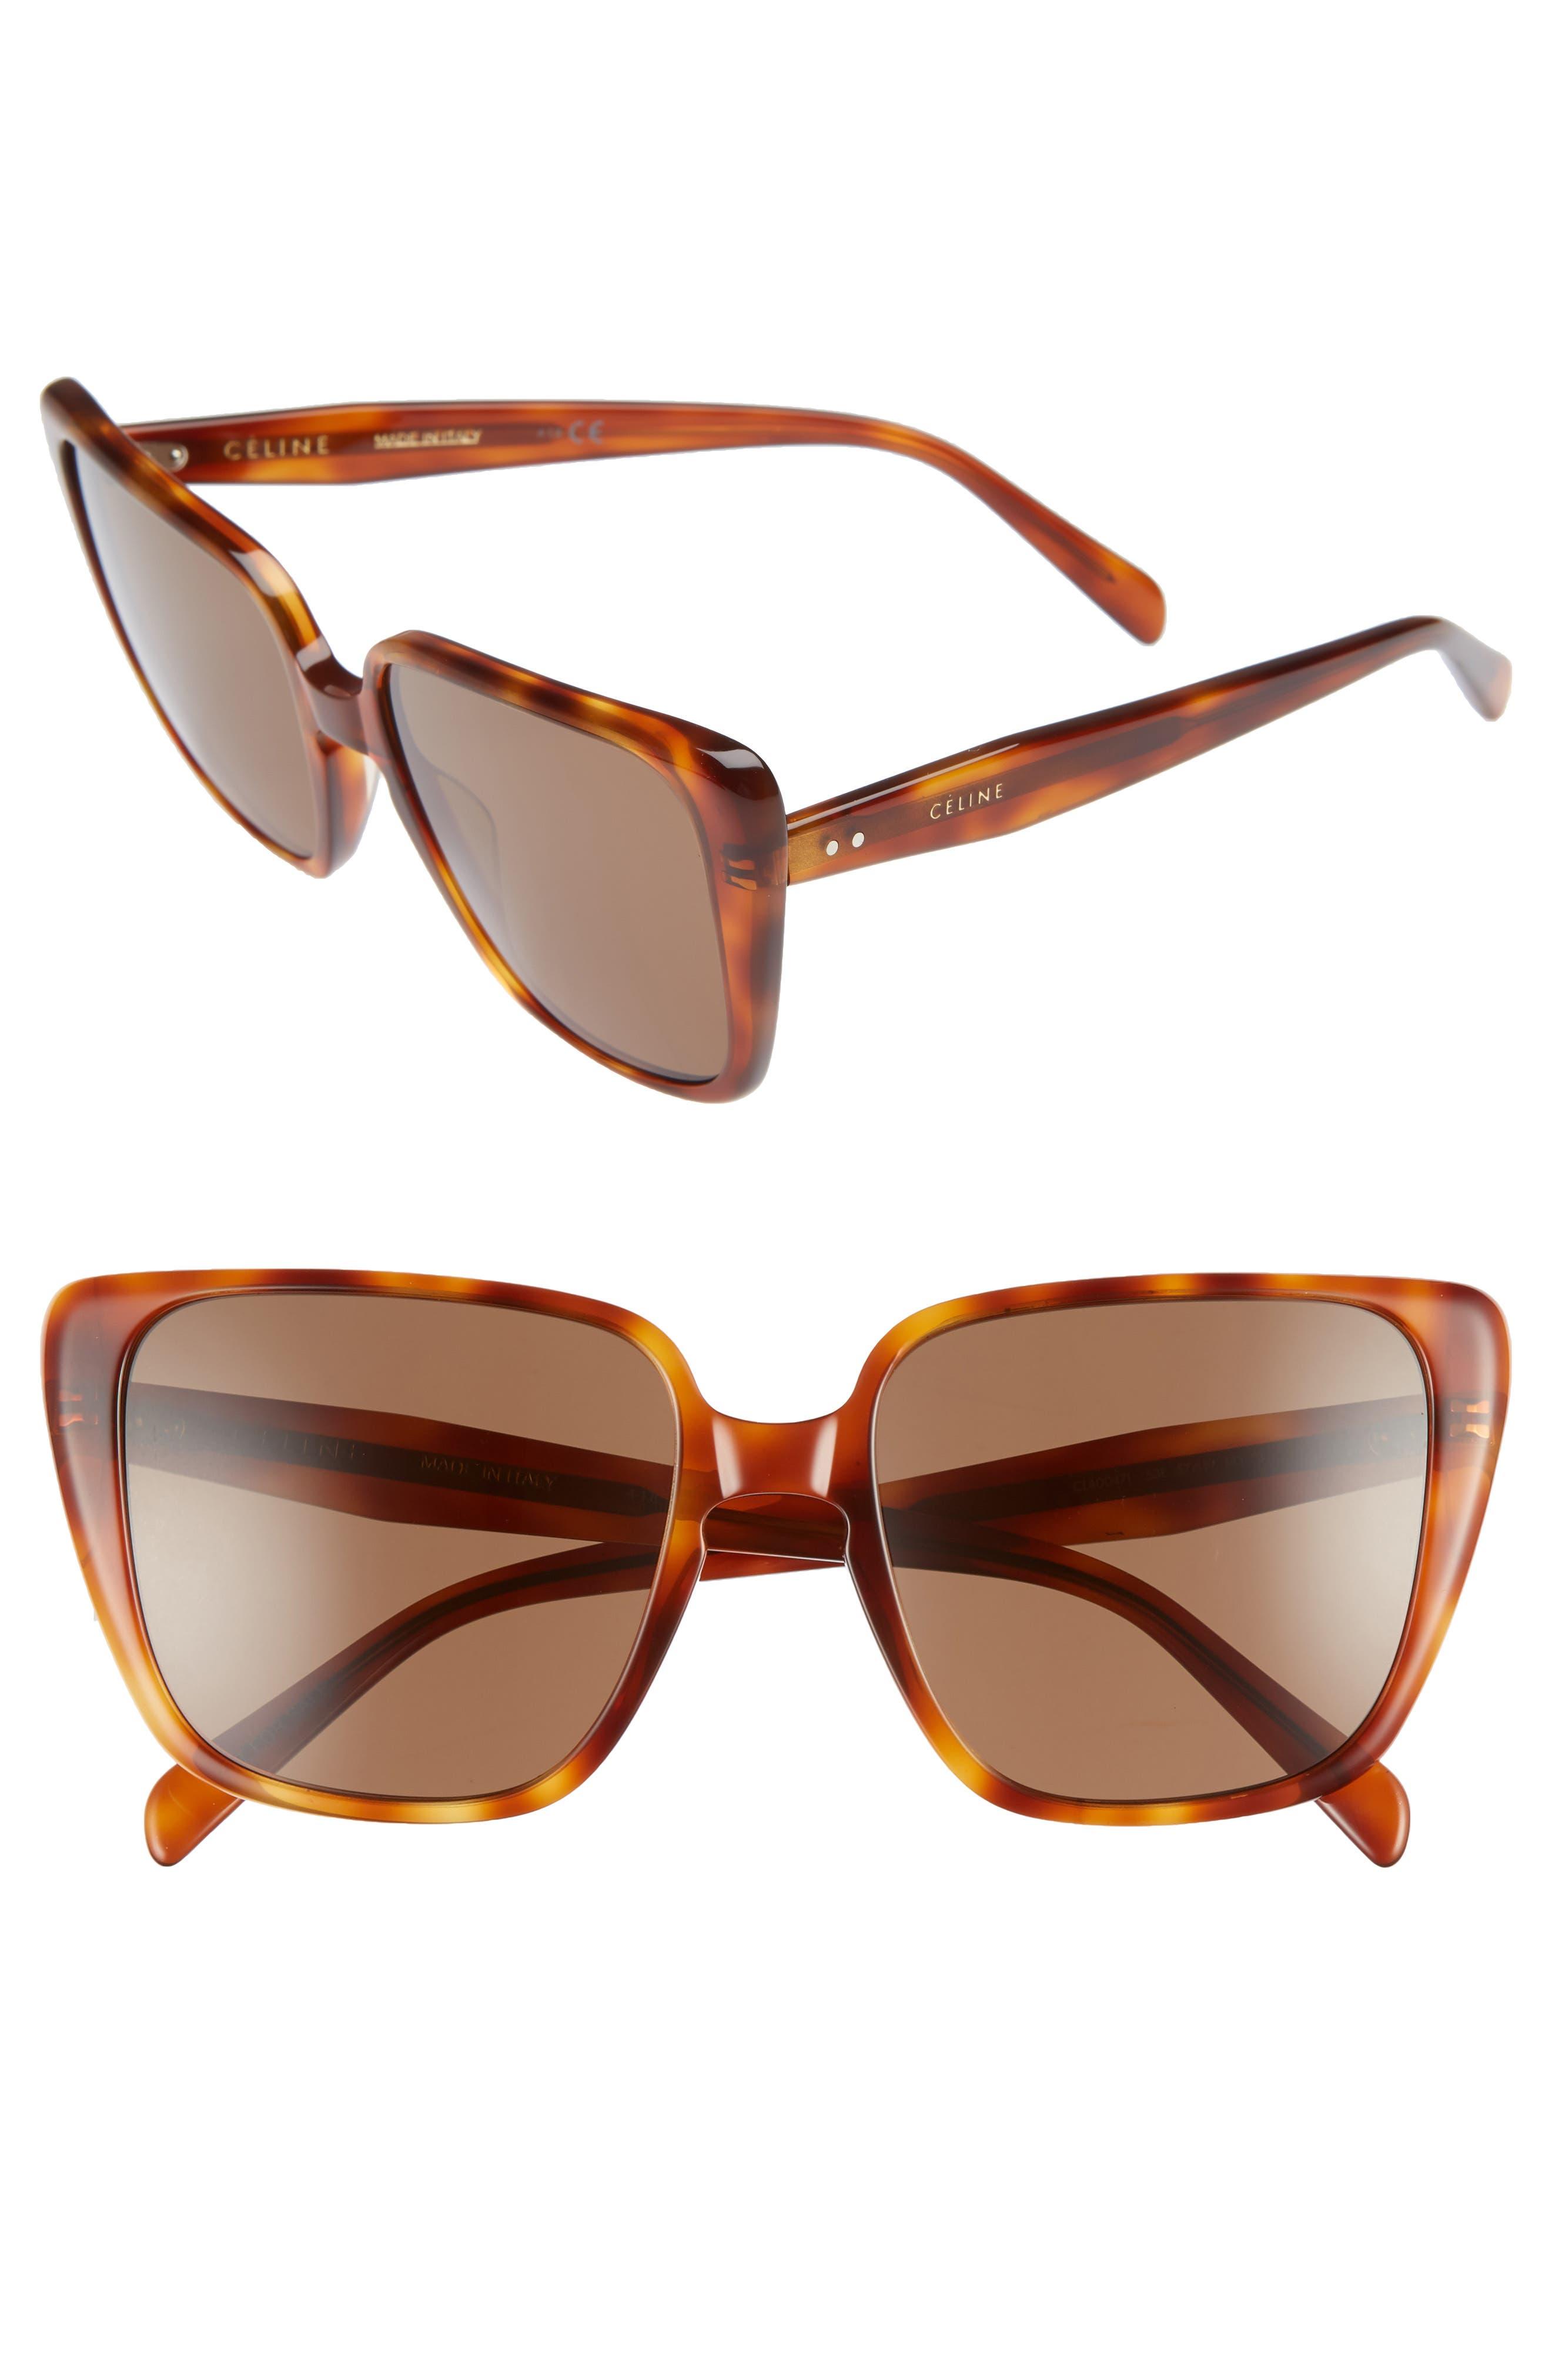 57Mm Modified Square Cat Eye Sunglasses - Blonde Havana